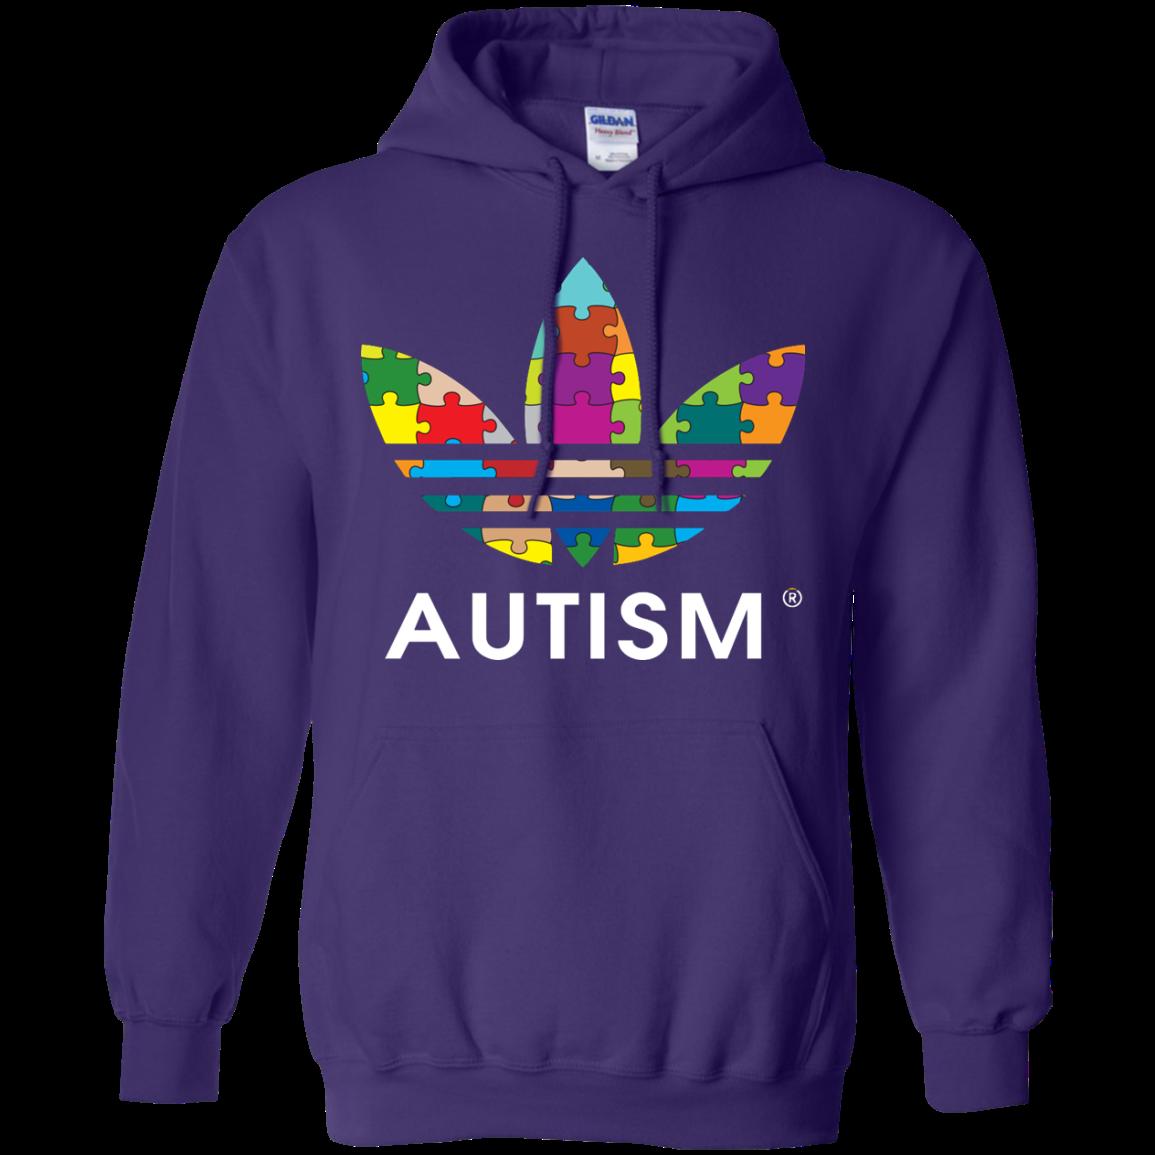 Autism hoodies